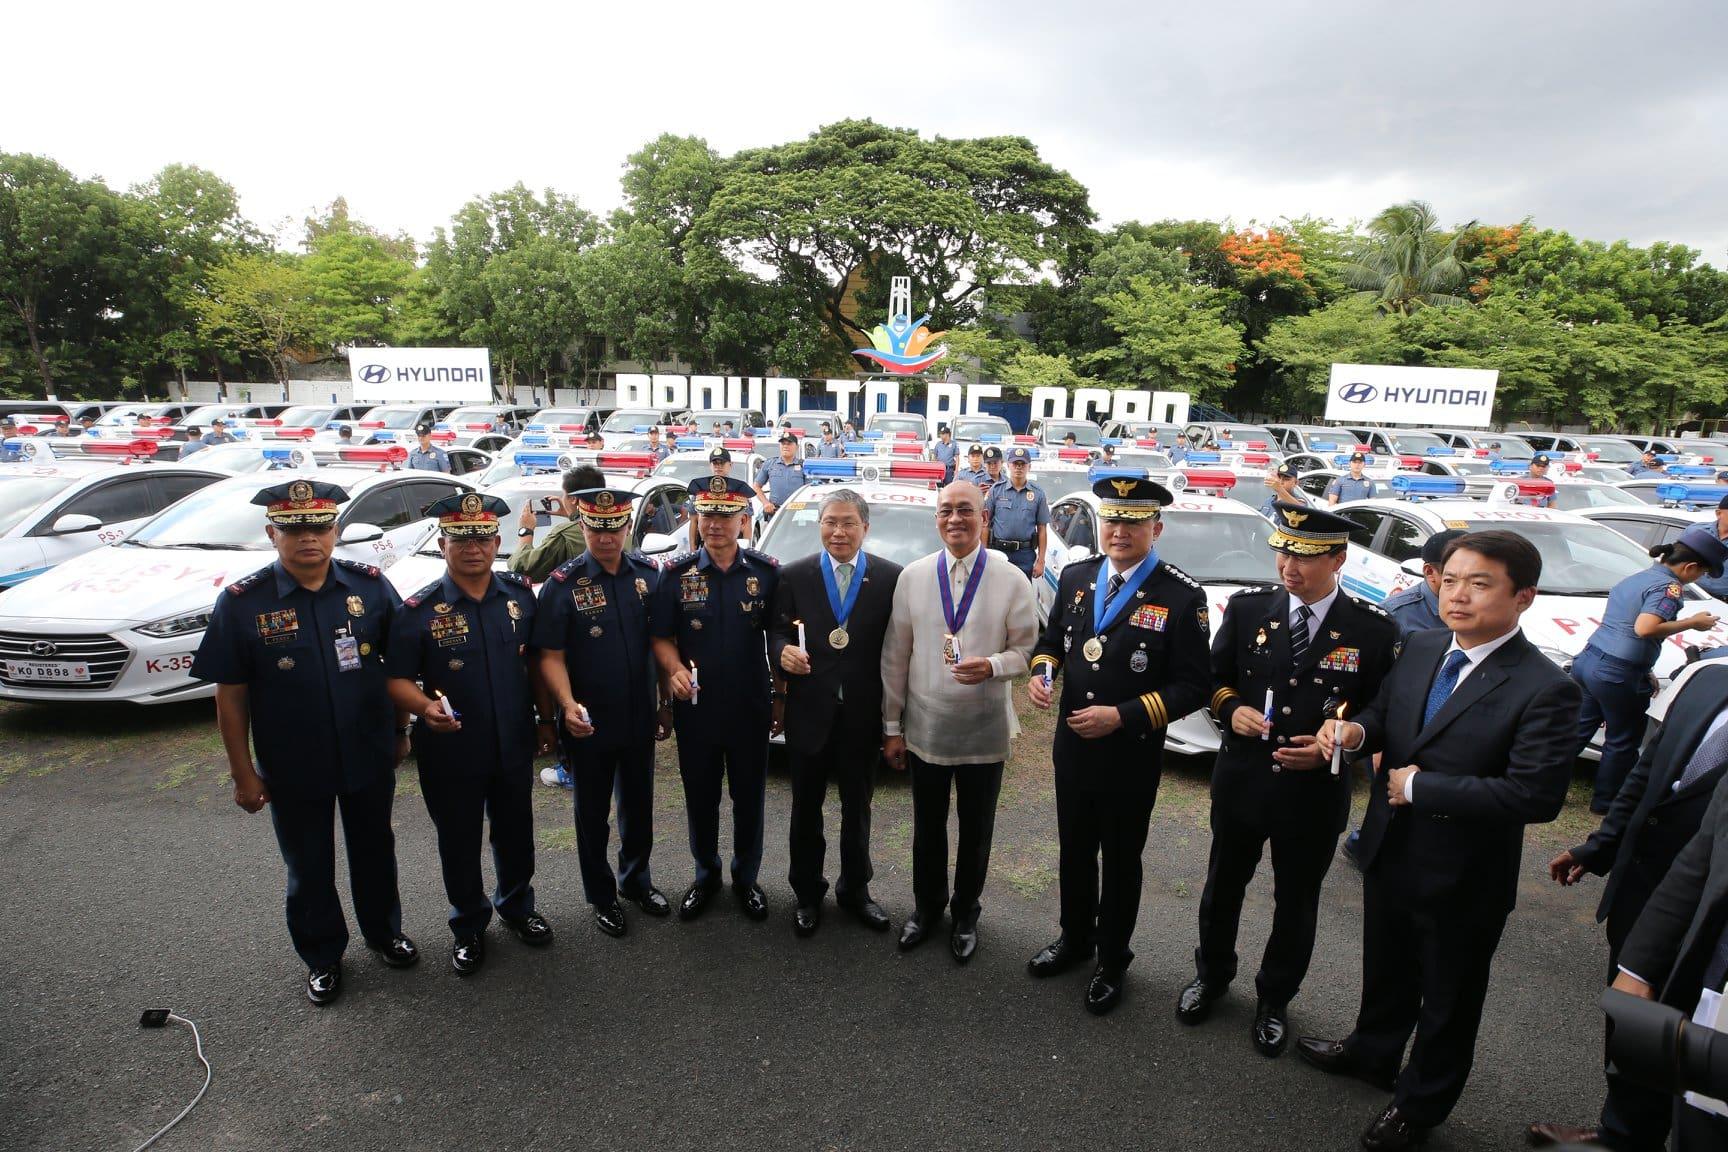 PNP Will Soon Use Hyundai Cars to Patrol the Streets